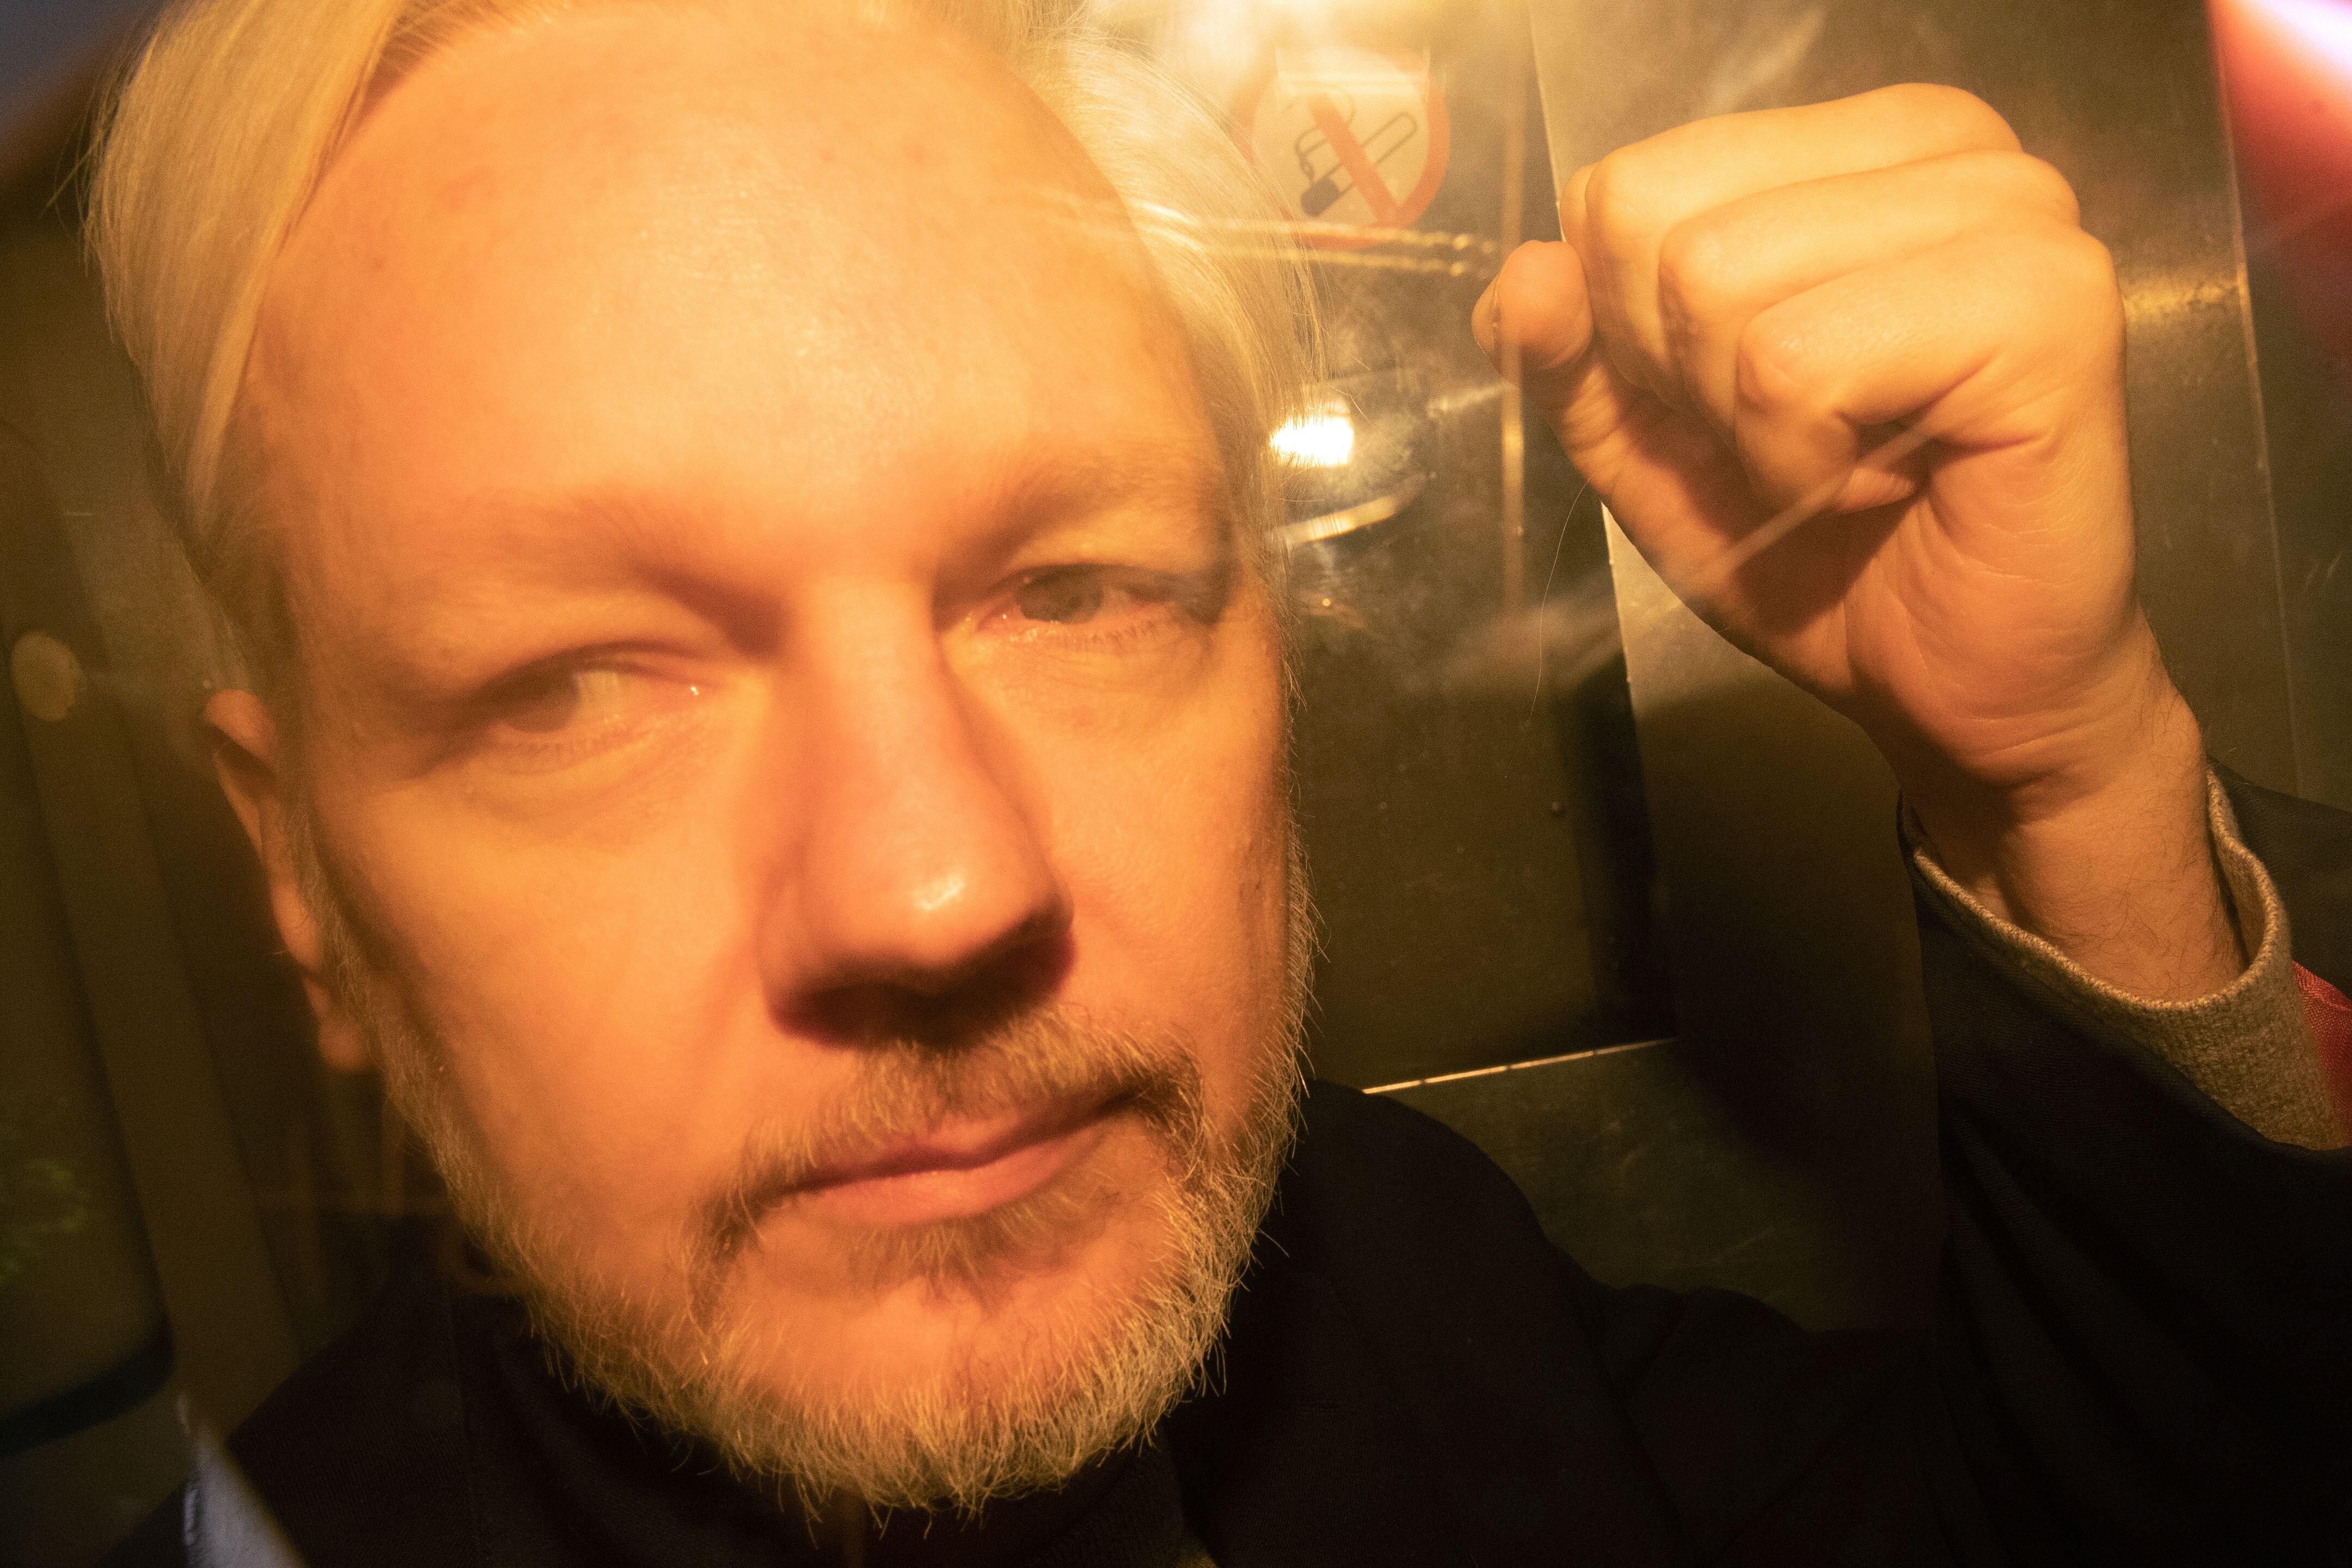 Julian Assange Sentenced To 50 Weeks In Jail For Breaching